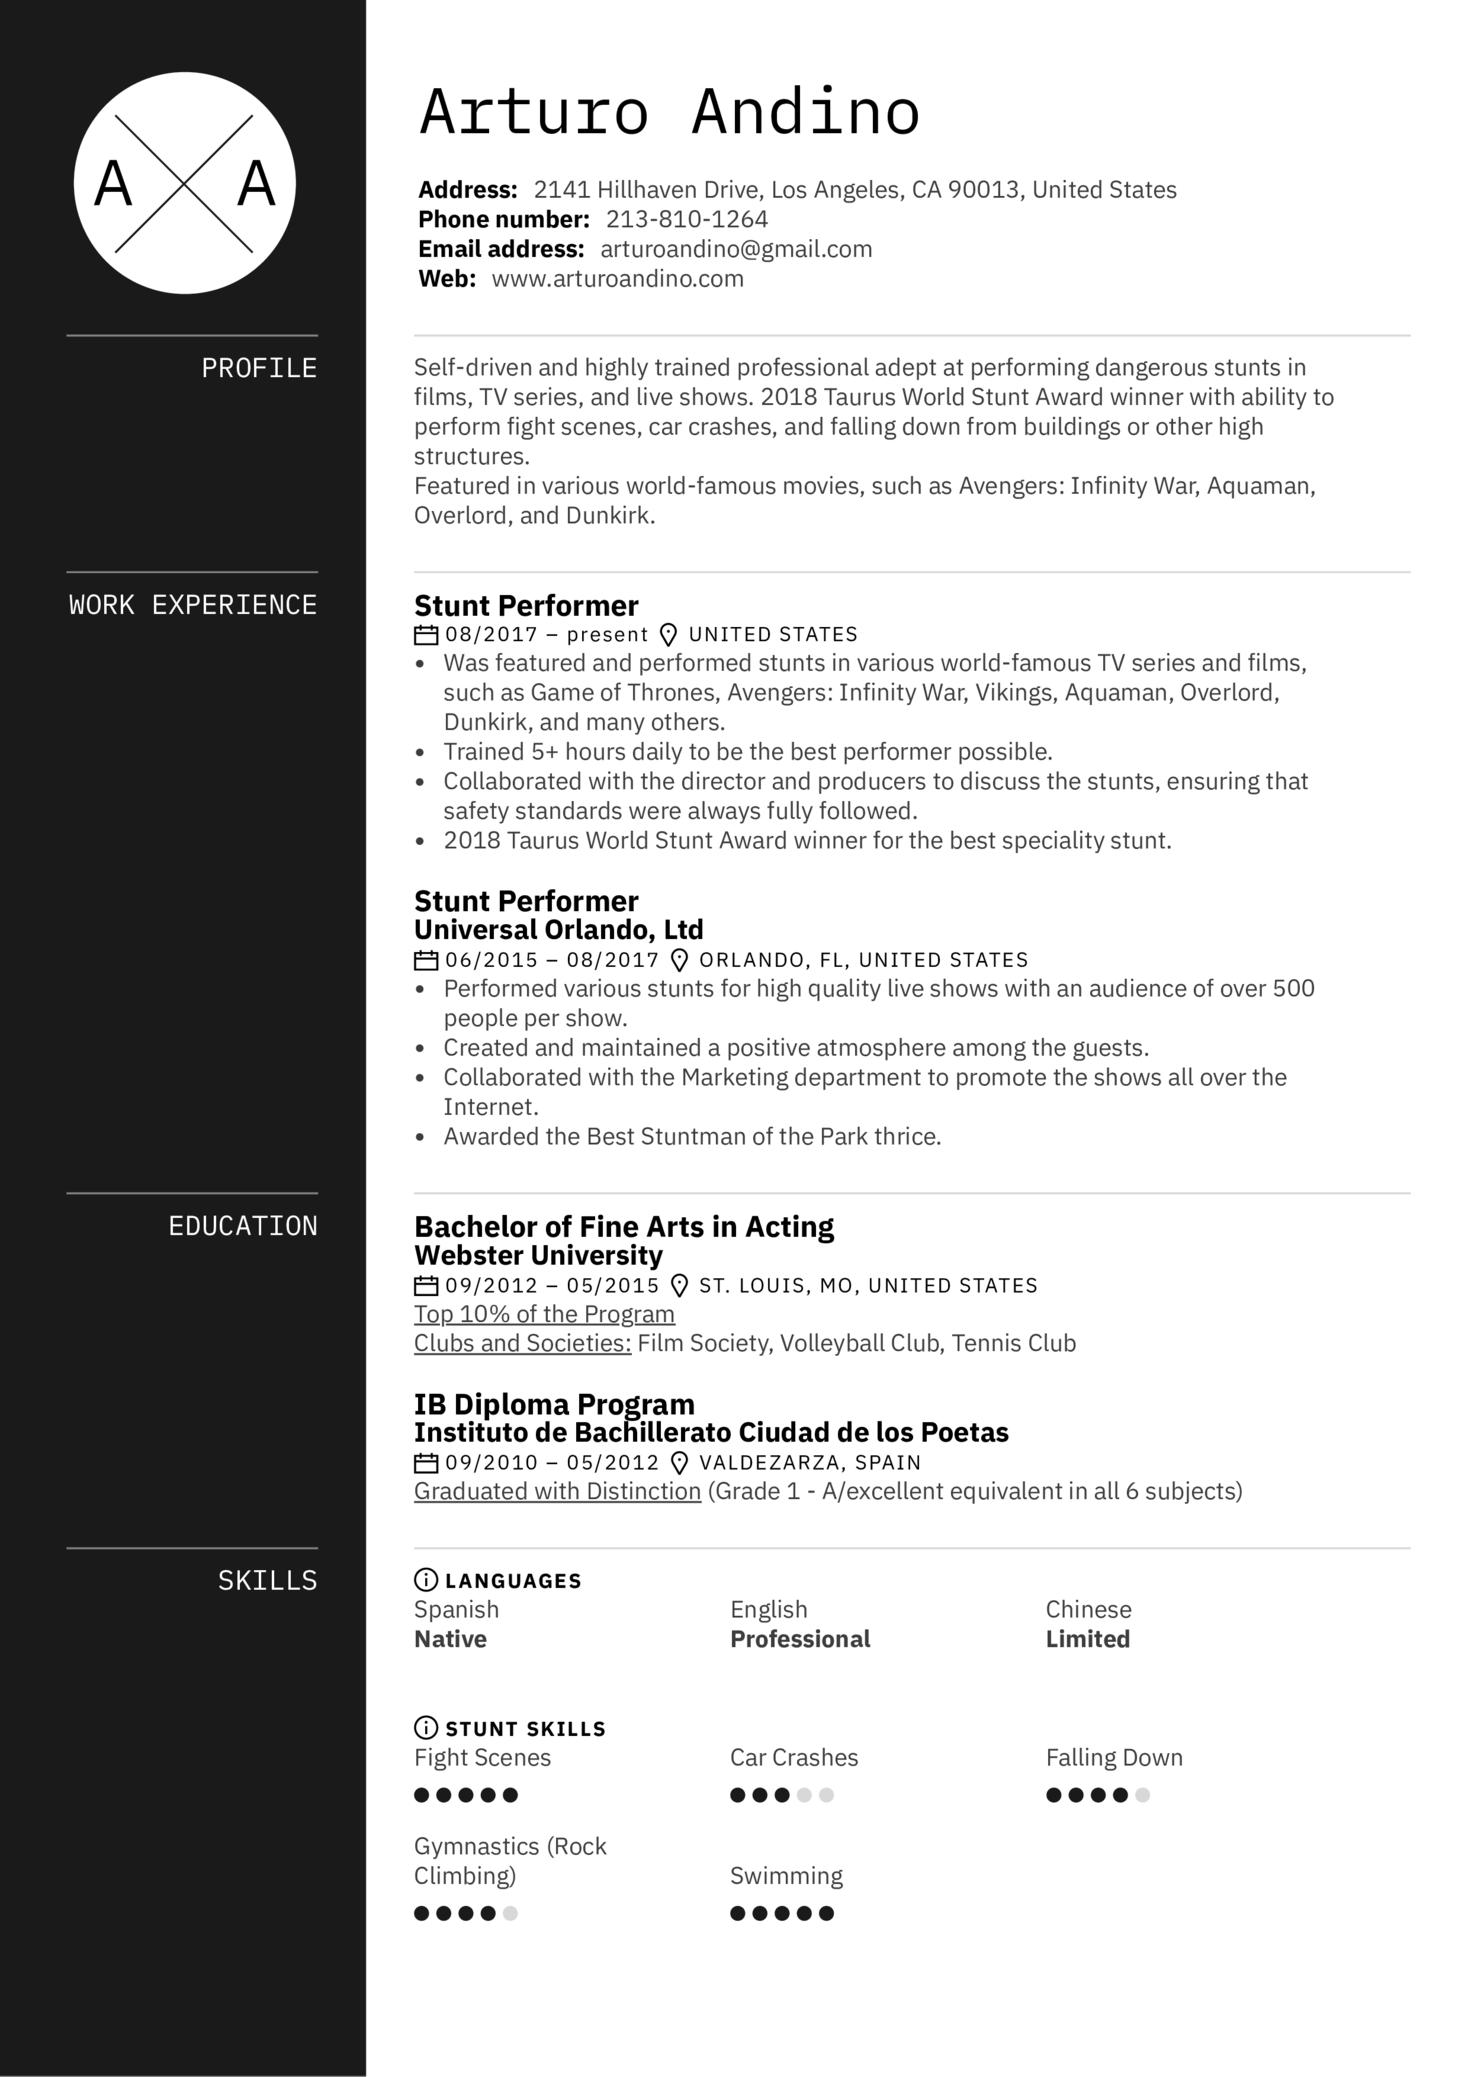 Stunt Performer Resume Example (Part 1)